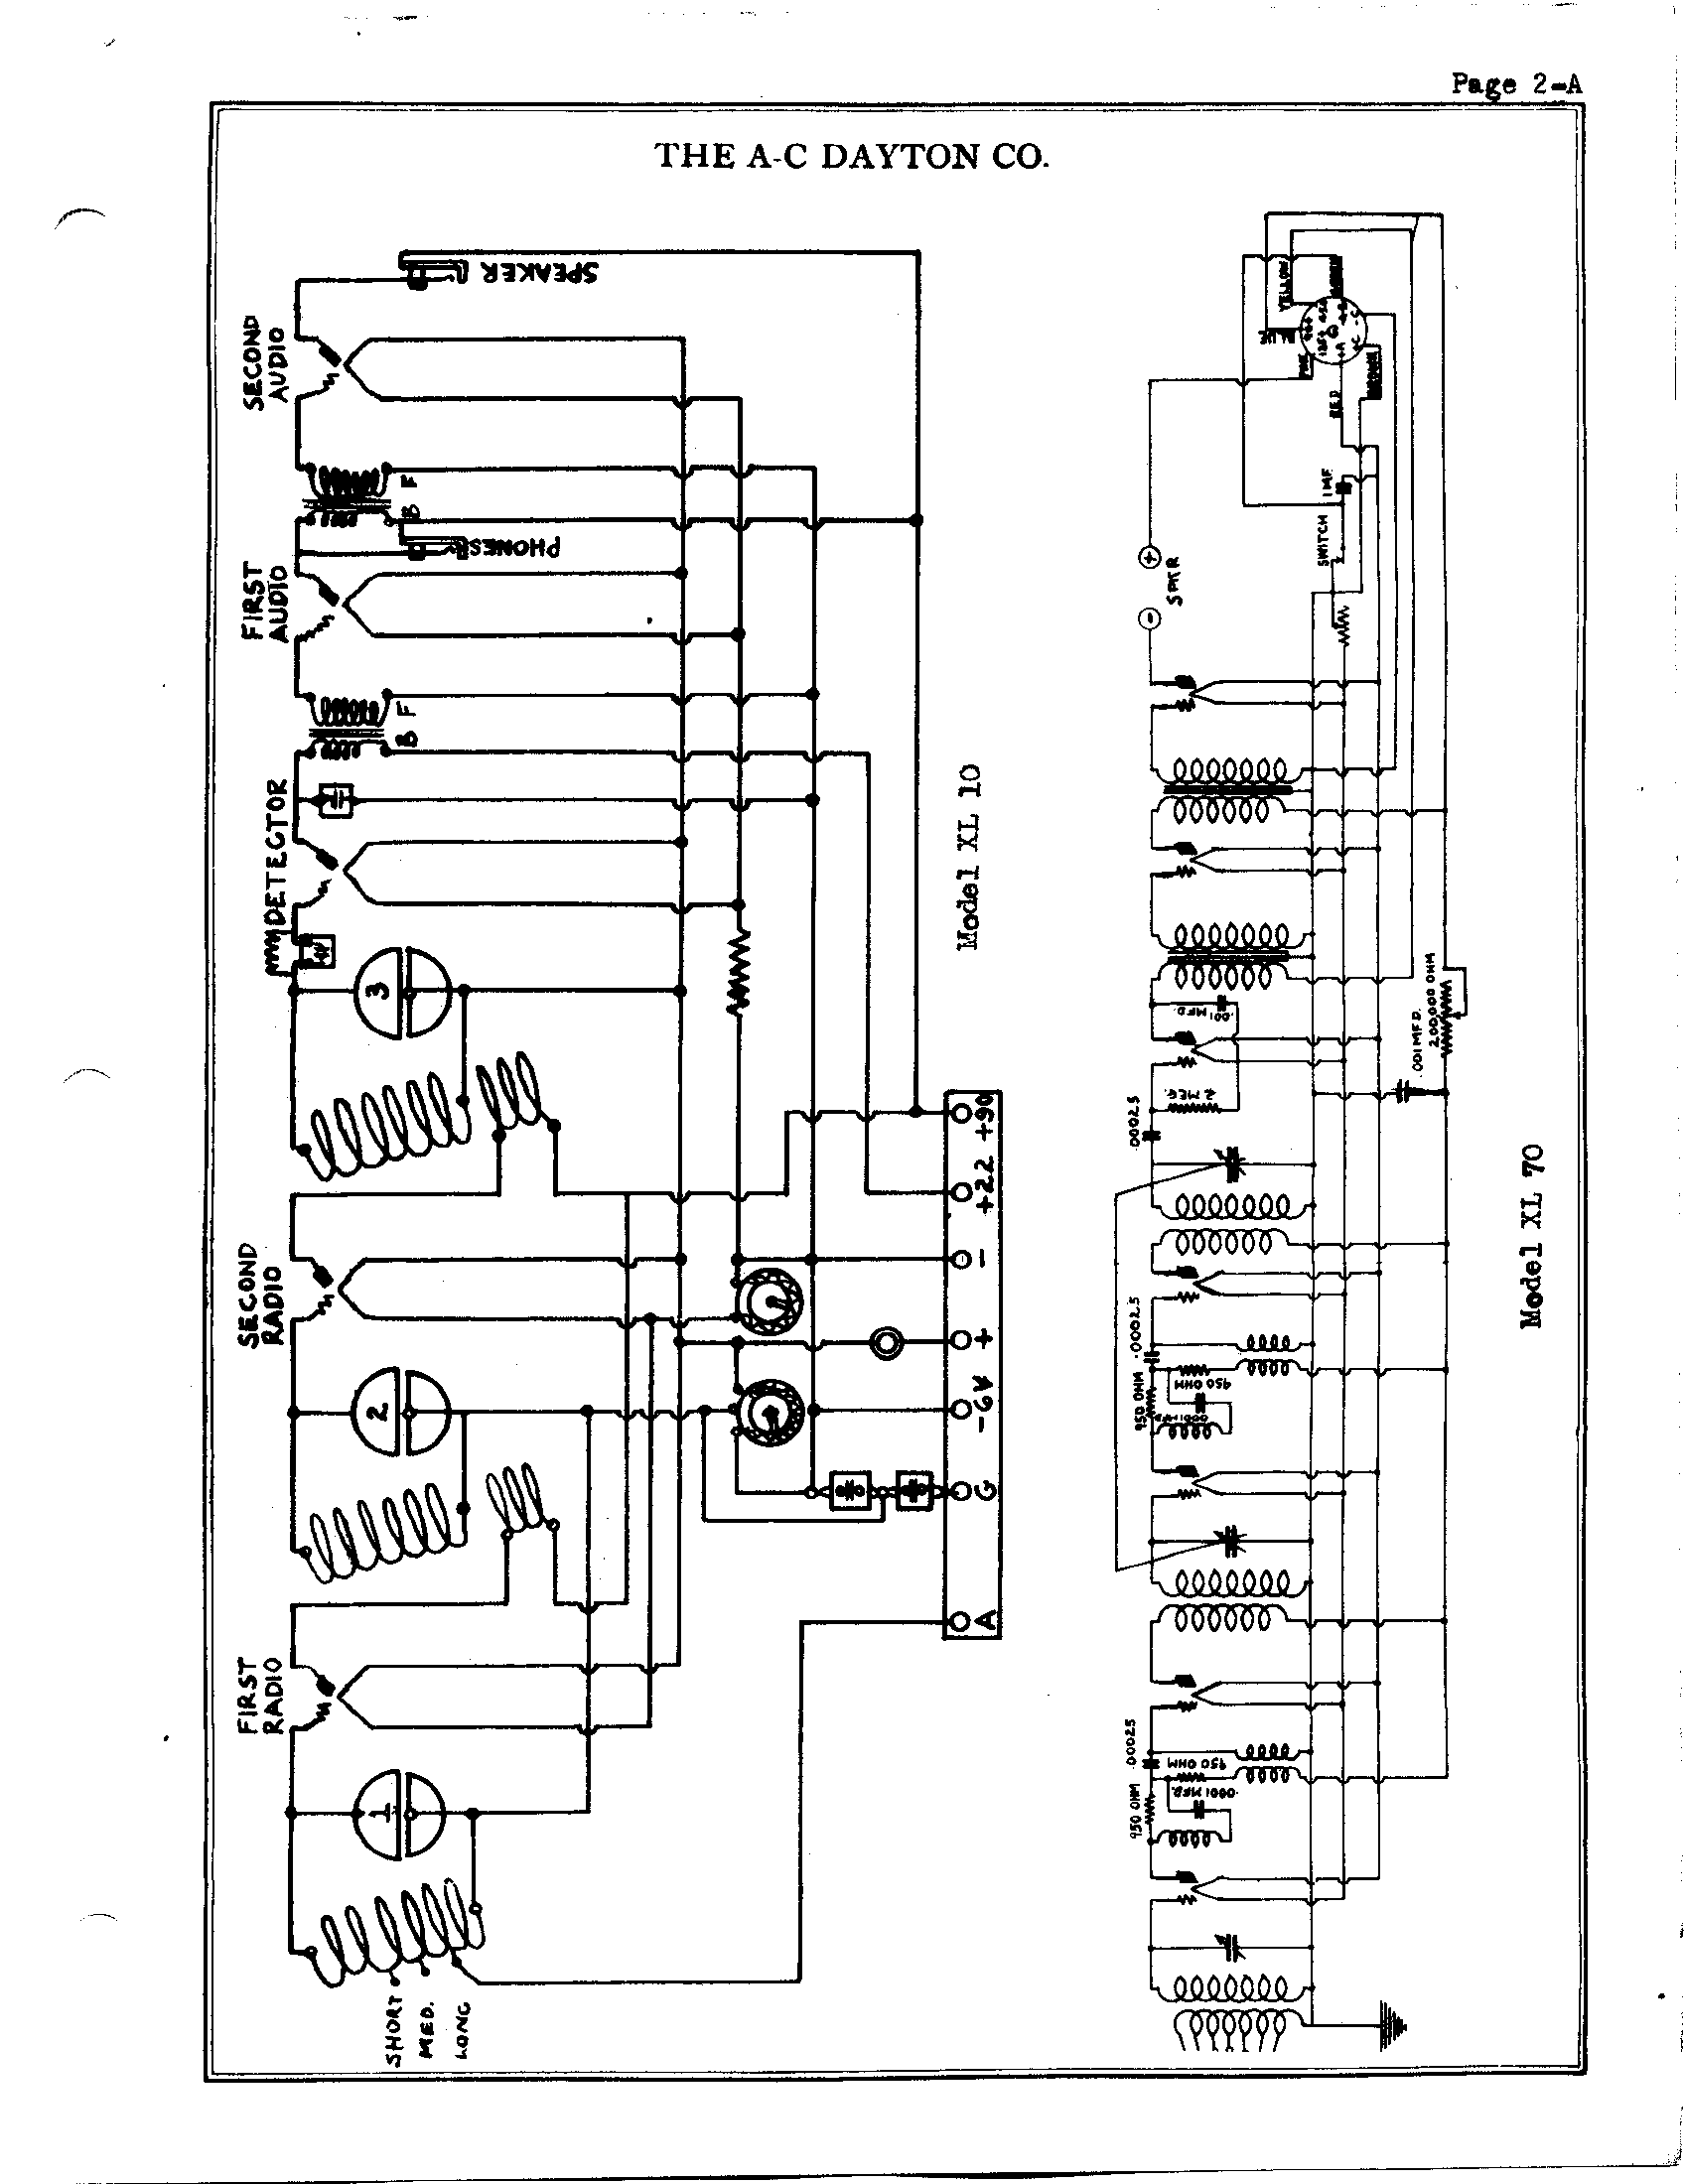 A C Dayton Company Xl10